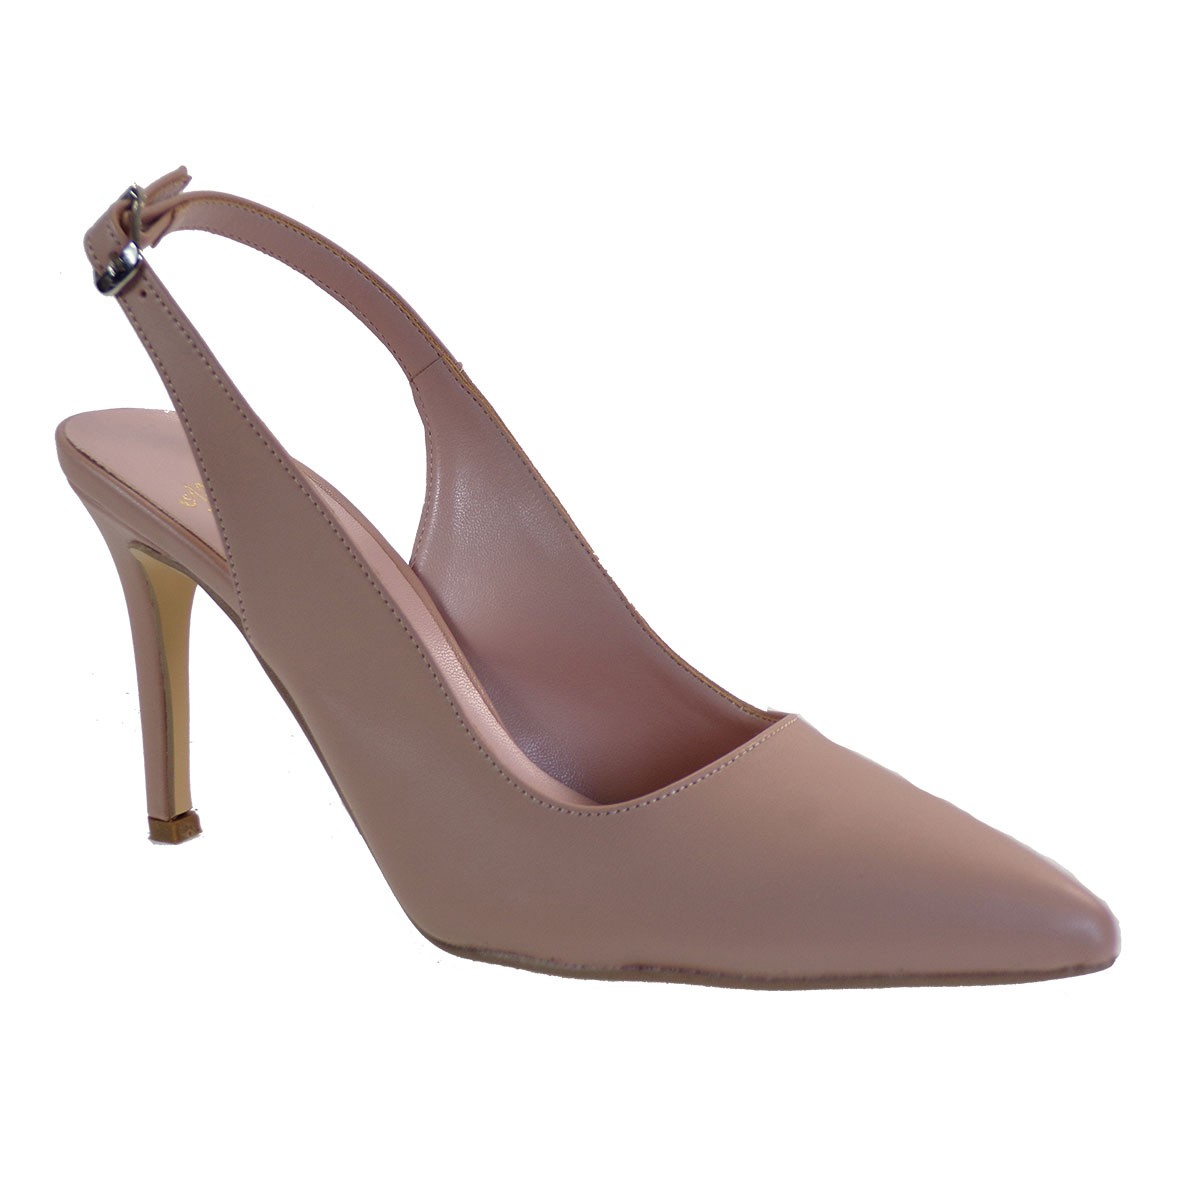 Alessandra Paggioti Γυναικεία Παπούτσια Γόβες 81000 Nude Ματ